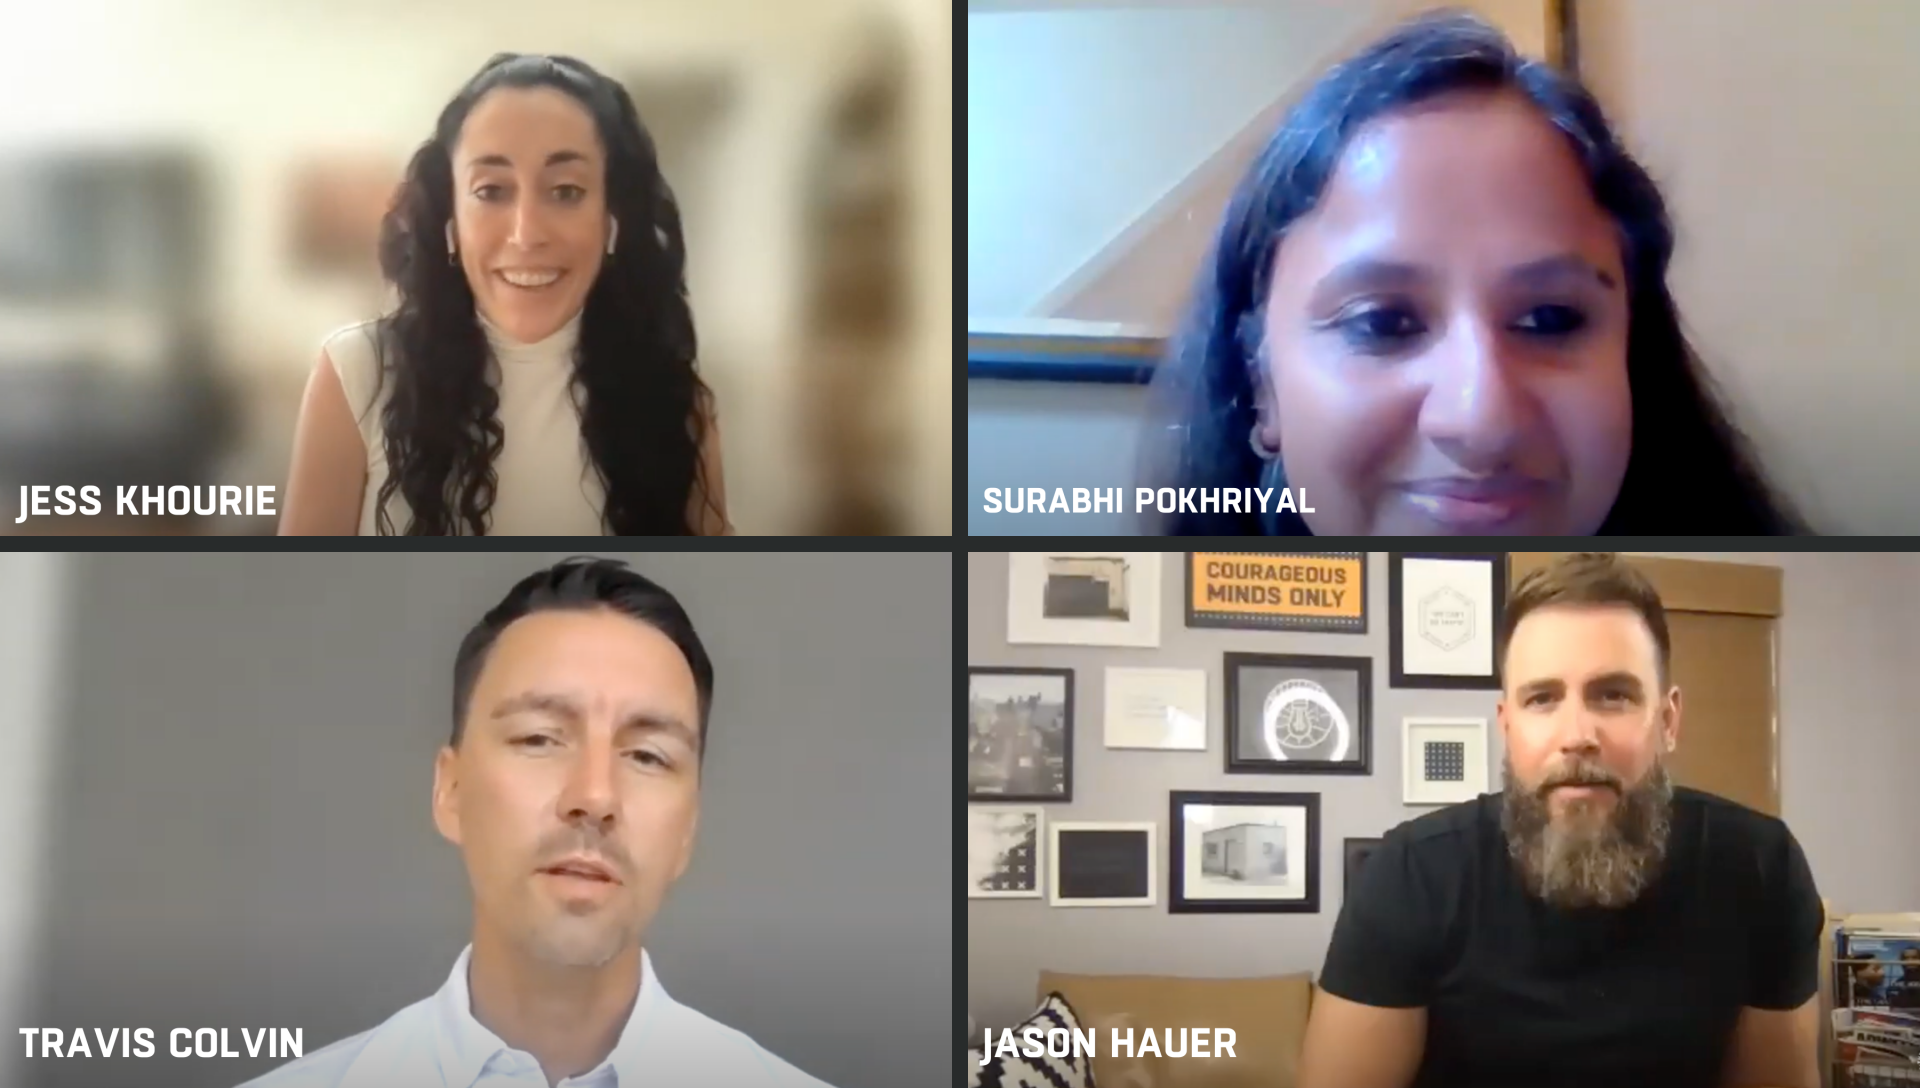 4 person frame: from top left Jess Khourie, Surabhi Pokhriyal, Travis Colvin, & Jason Hauer